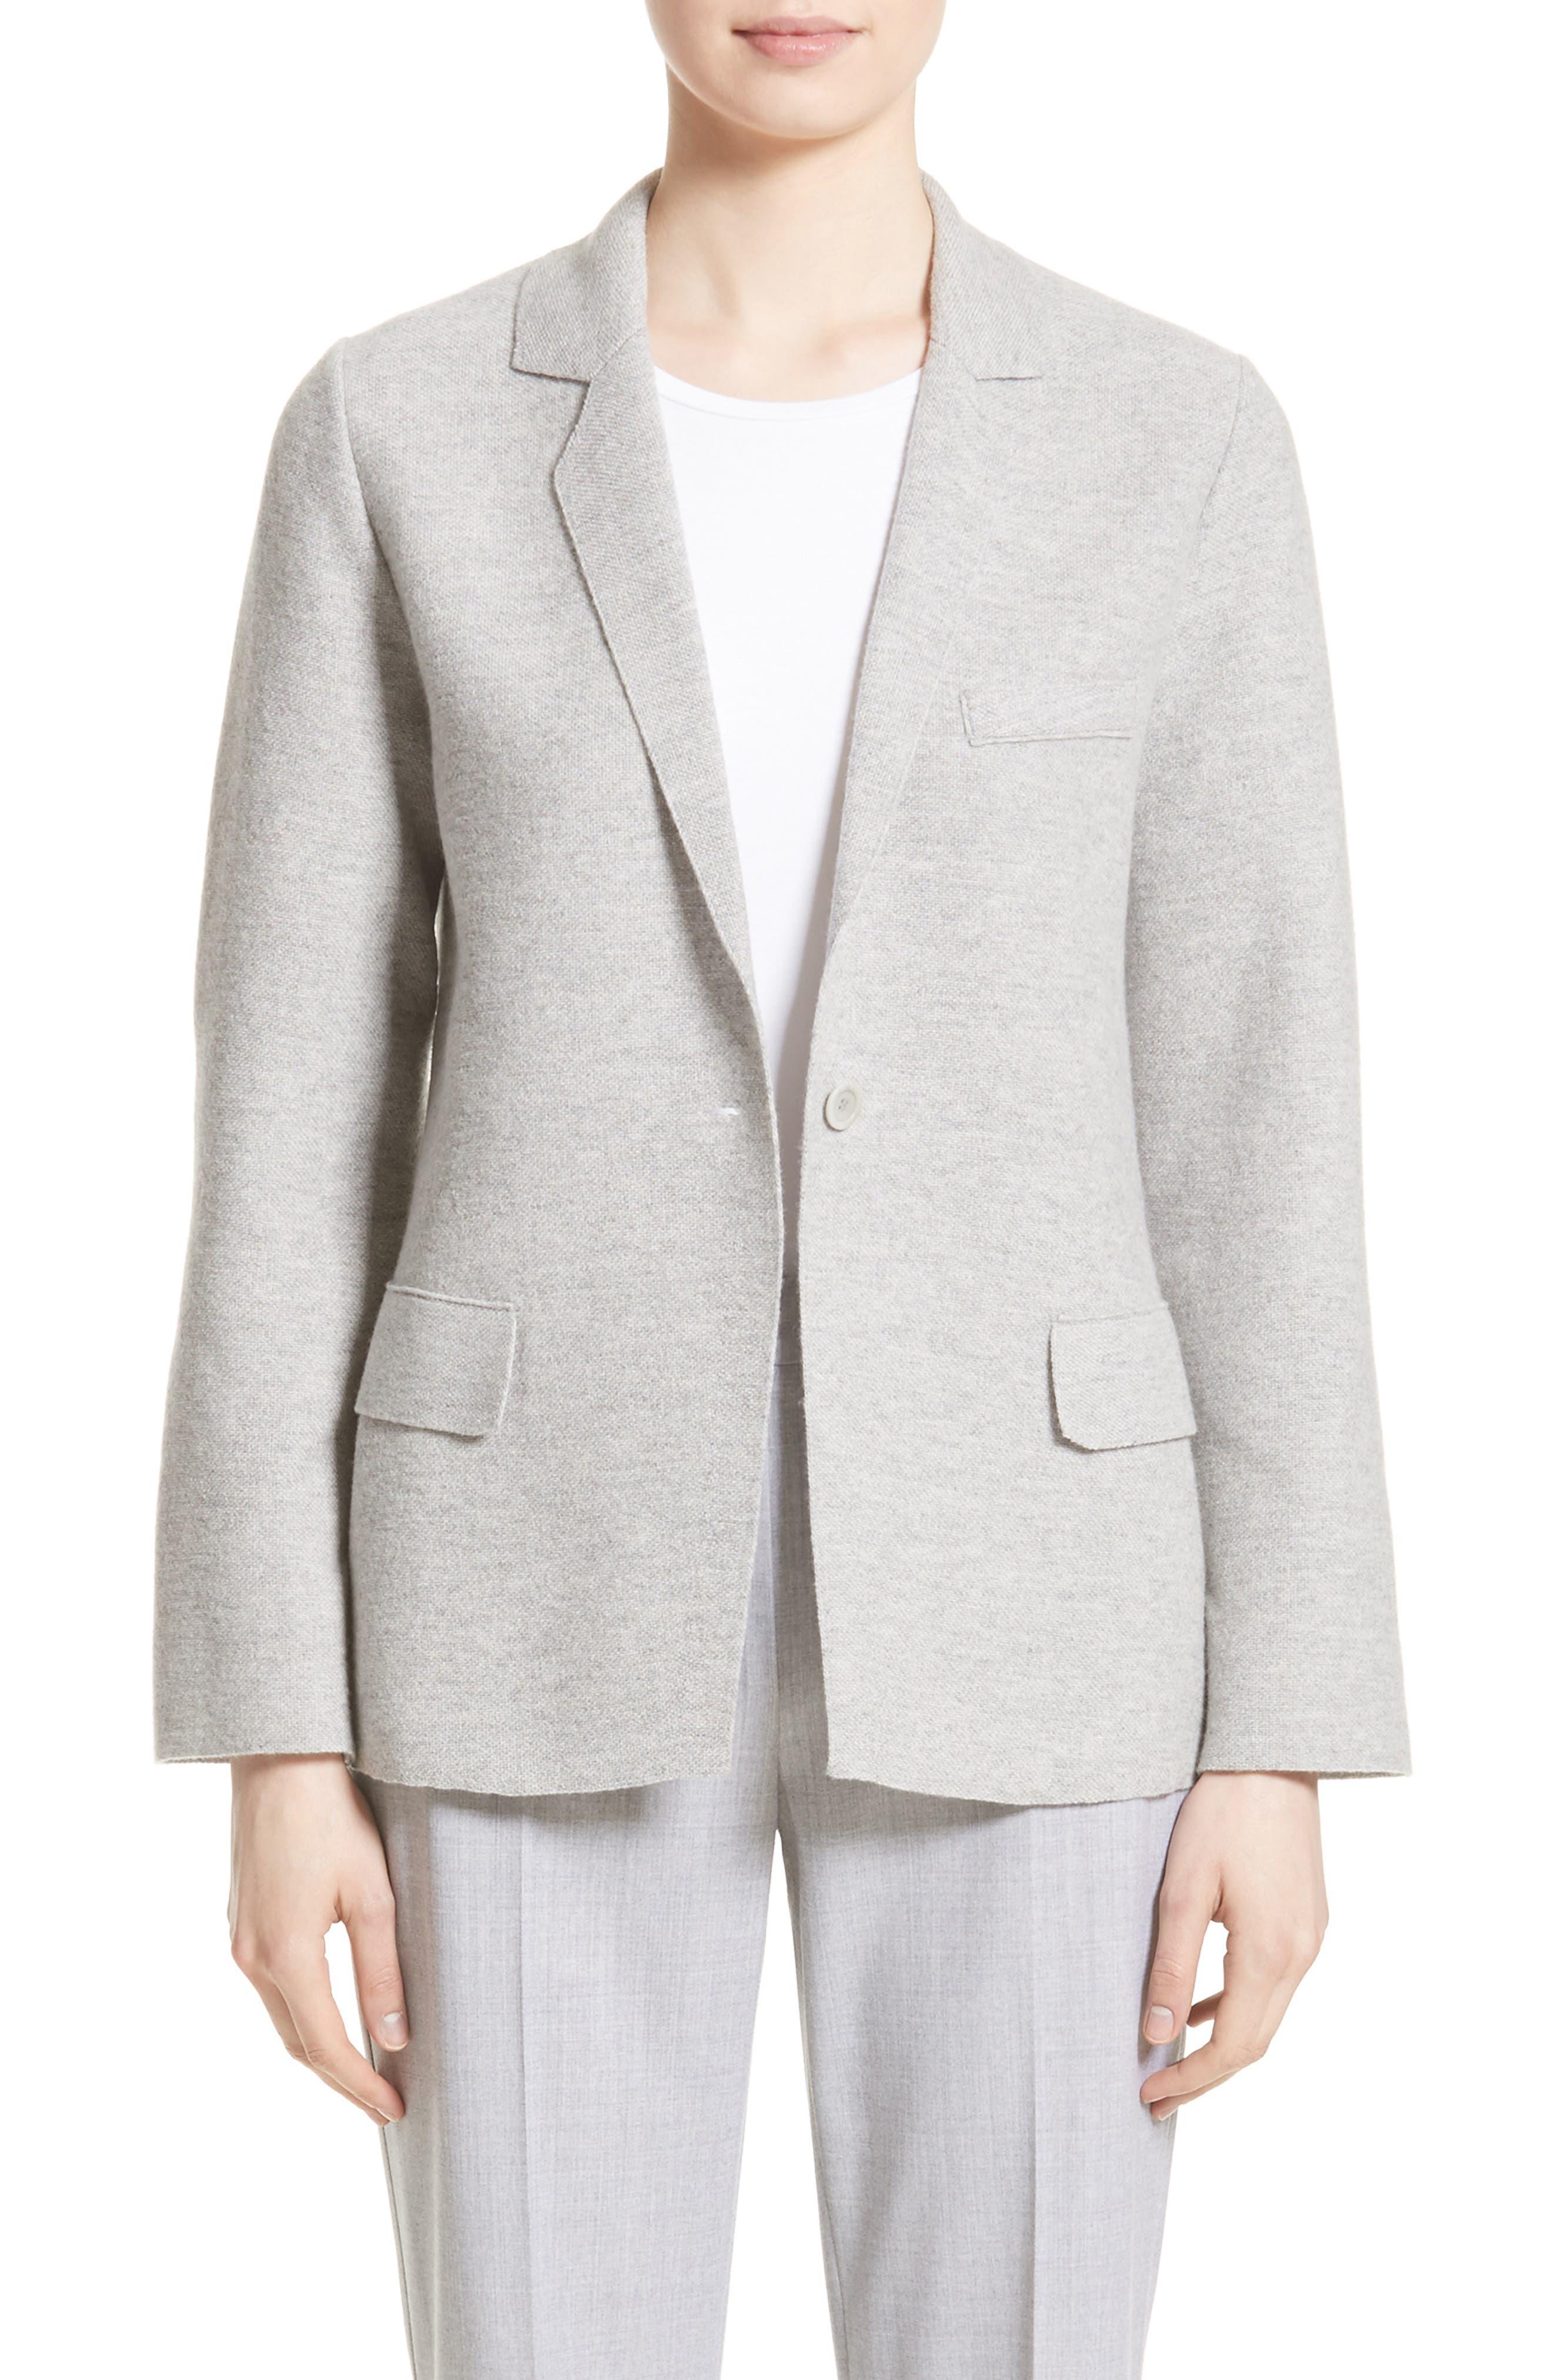 Segnale Cashmere Jacket,                         Main,                         color, Light Grey